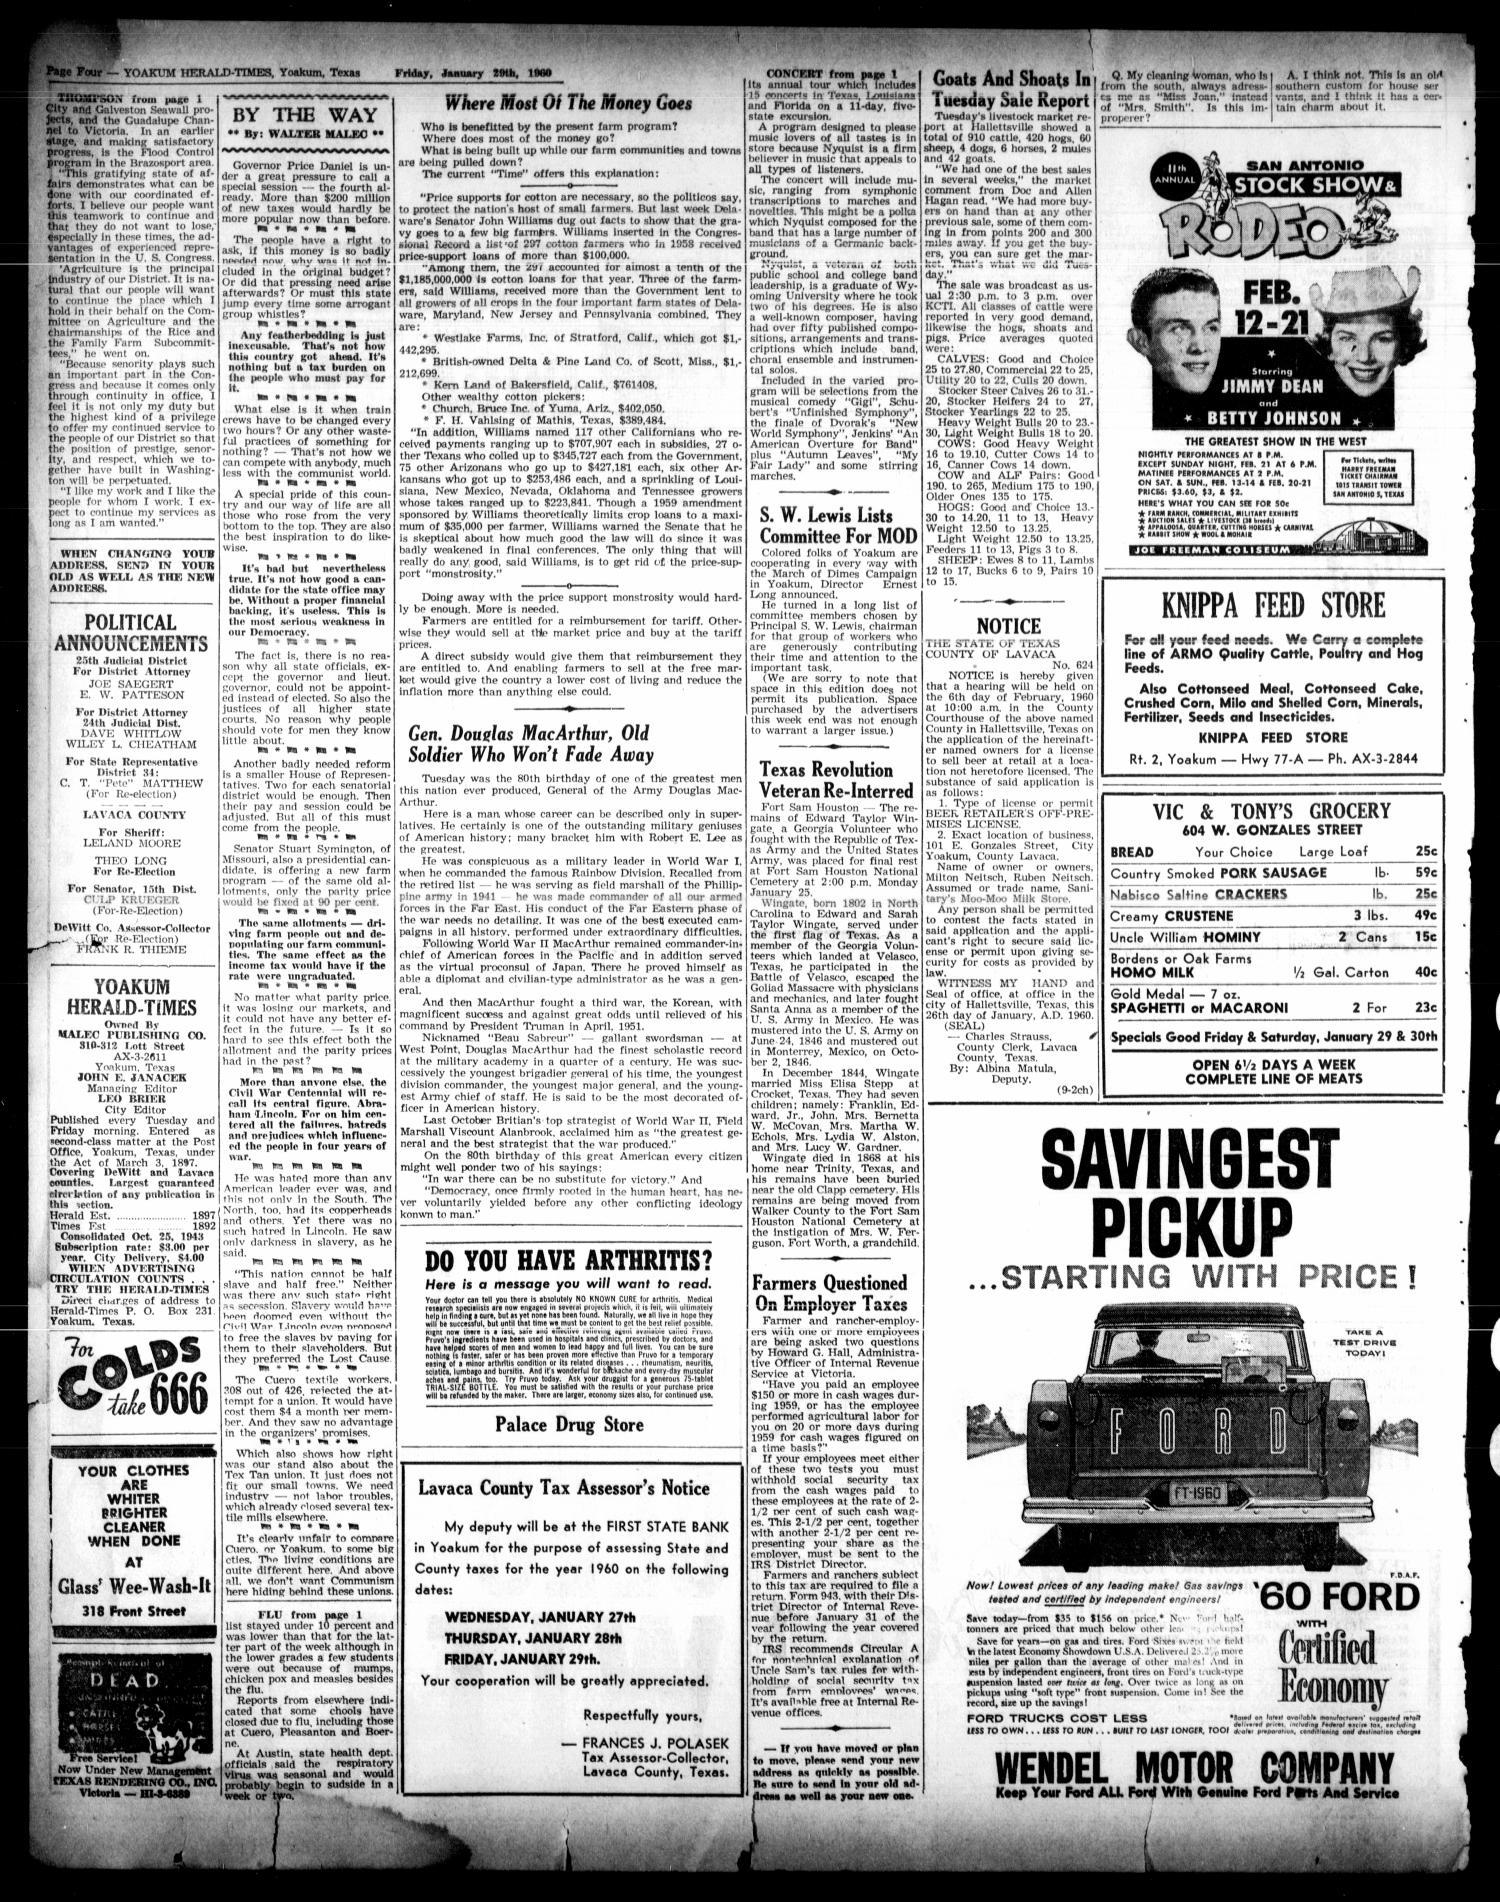 Yoakum Herald-Times (Yoakum, Tex ), Vol  64, No  9, Ed  1